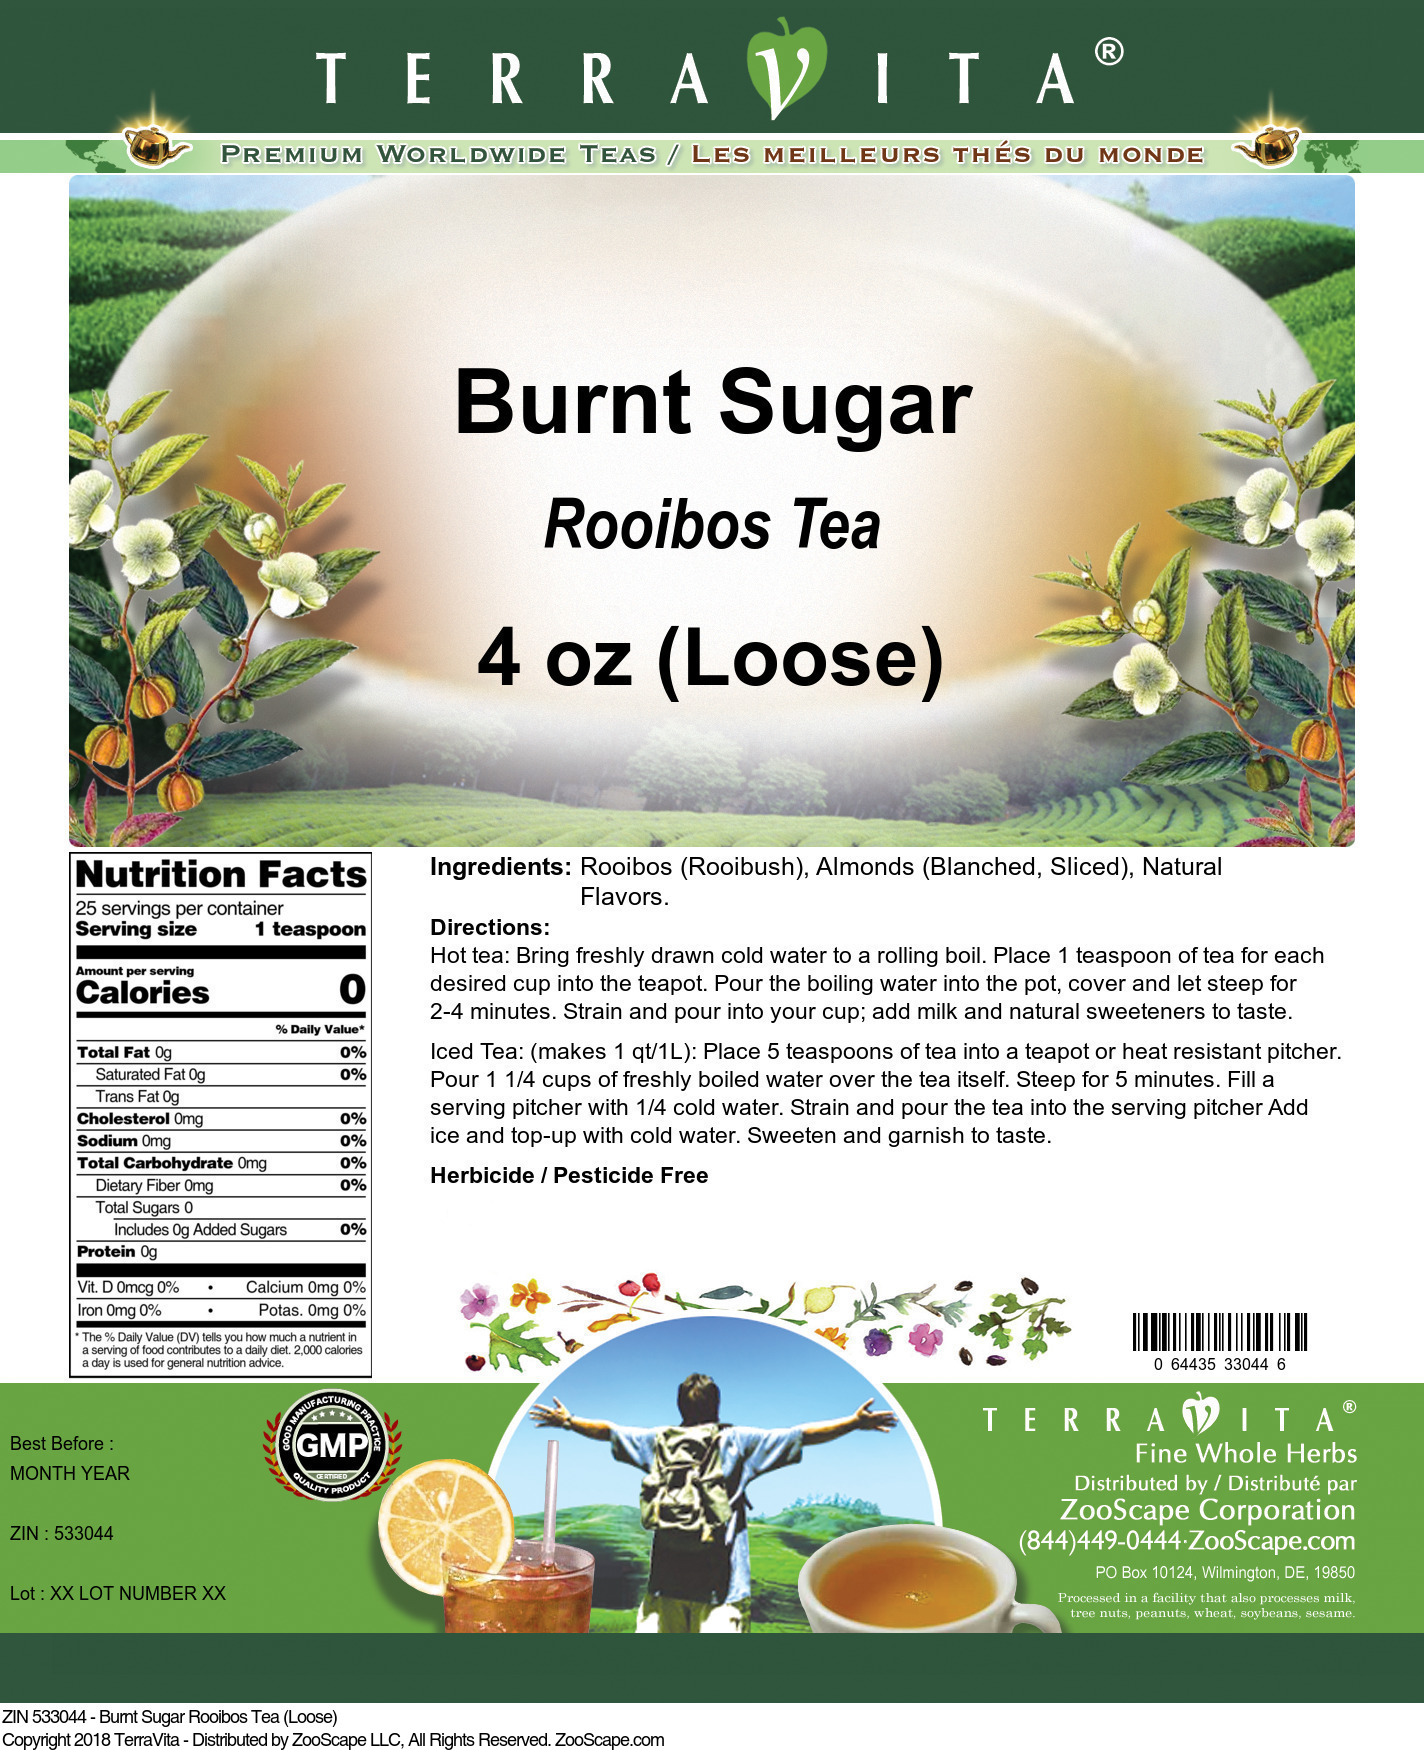 Burnt Sugar Rooibos Tea